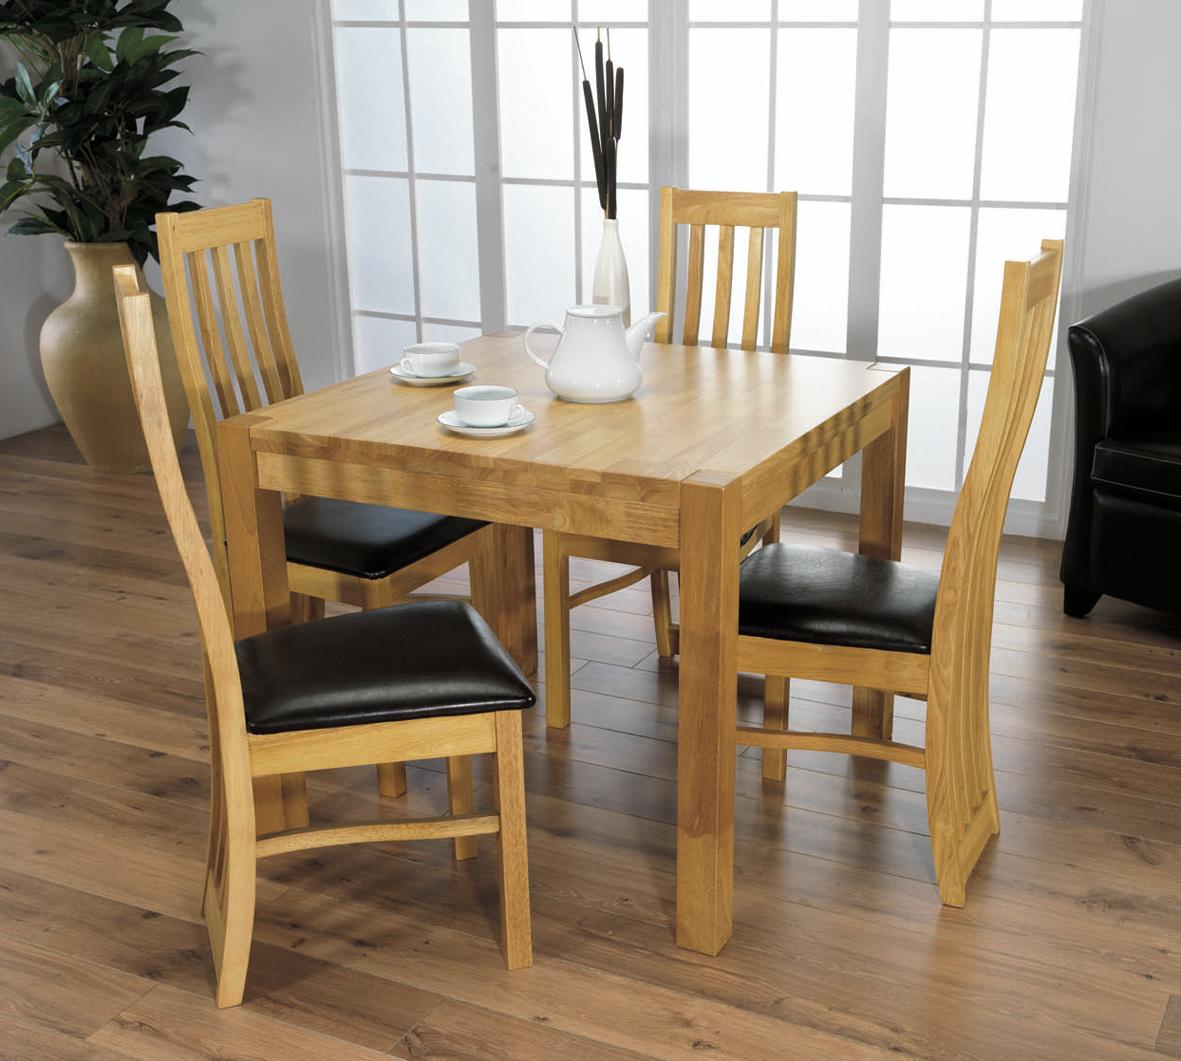 Round pedestal kitchen table photo - 2